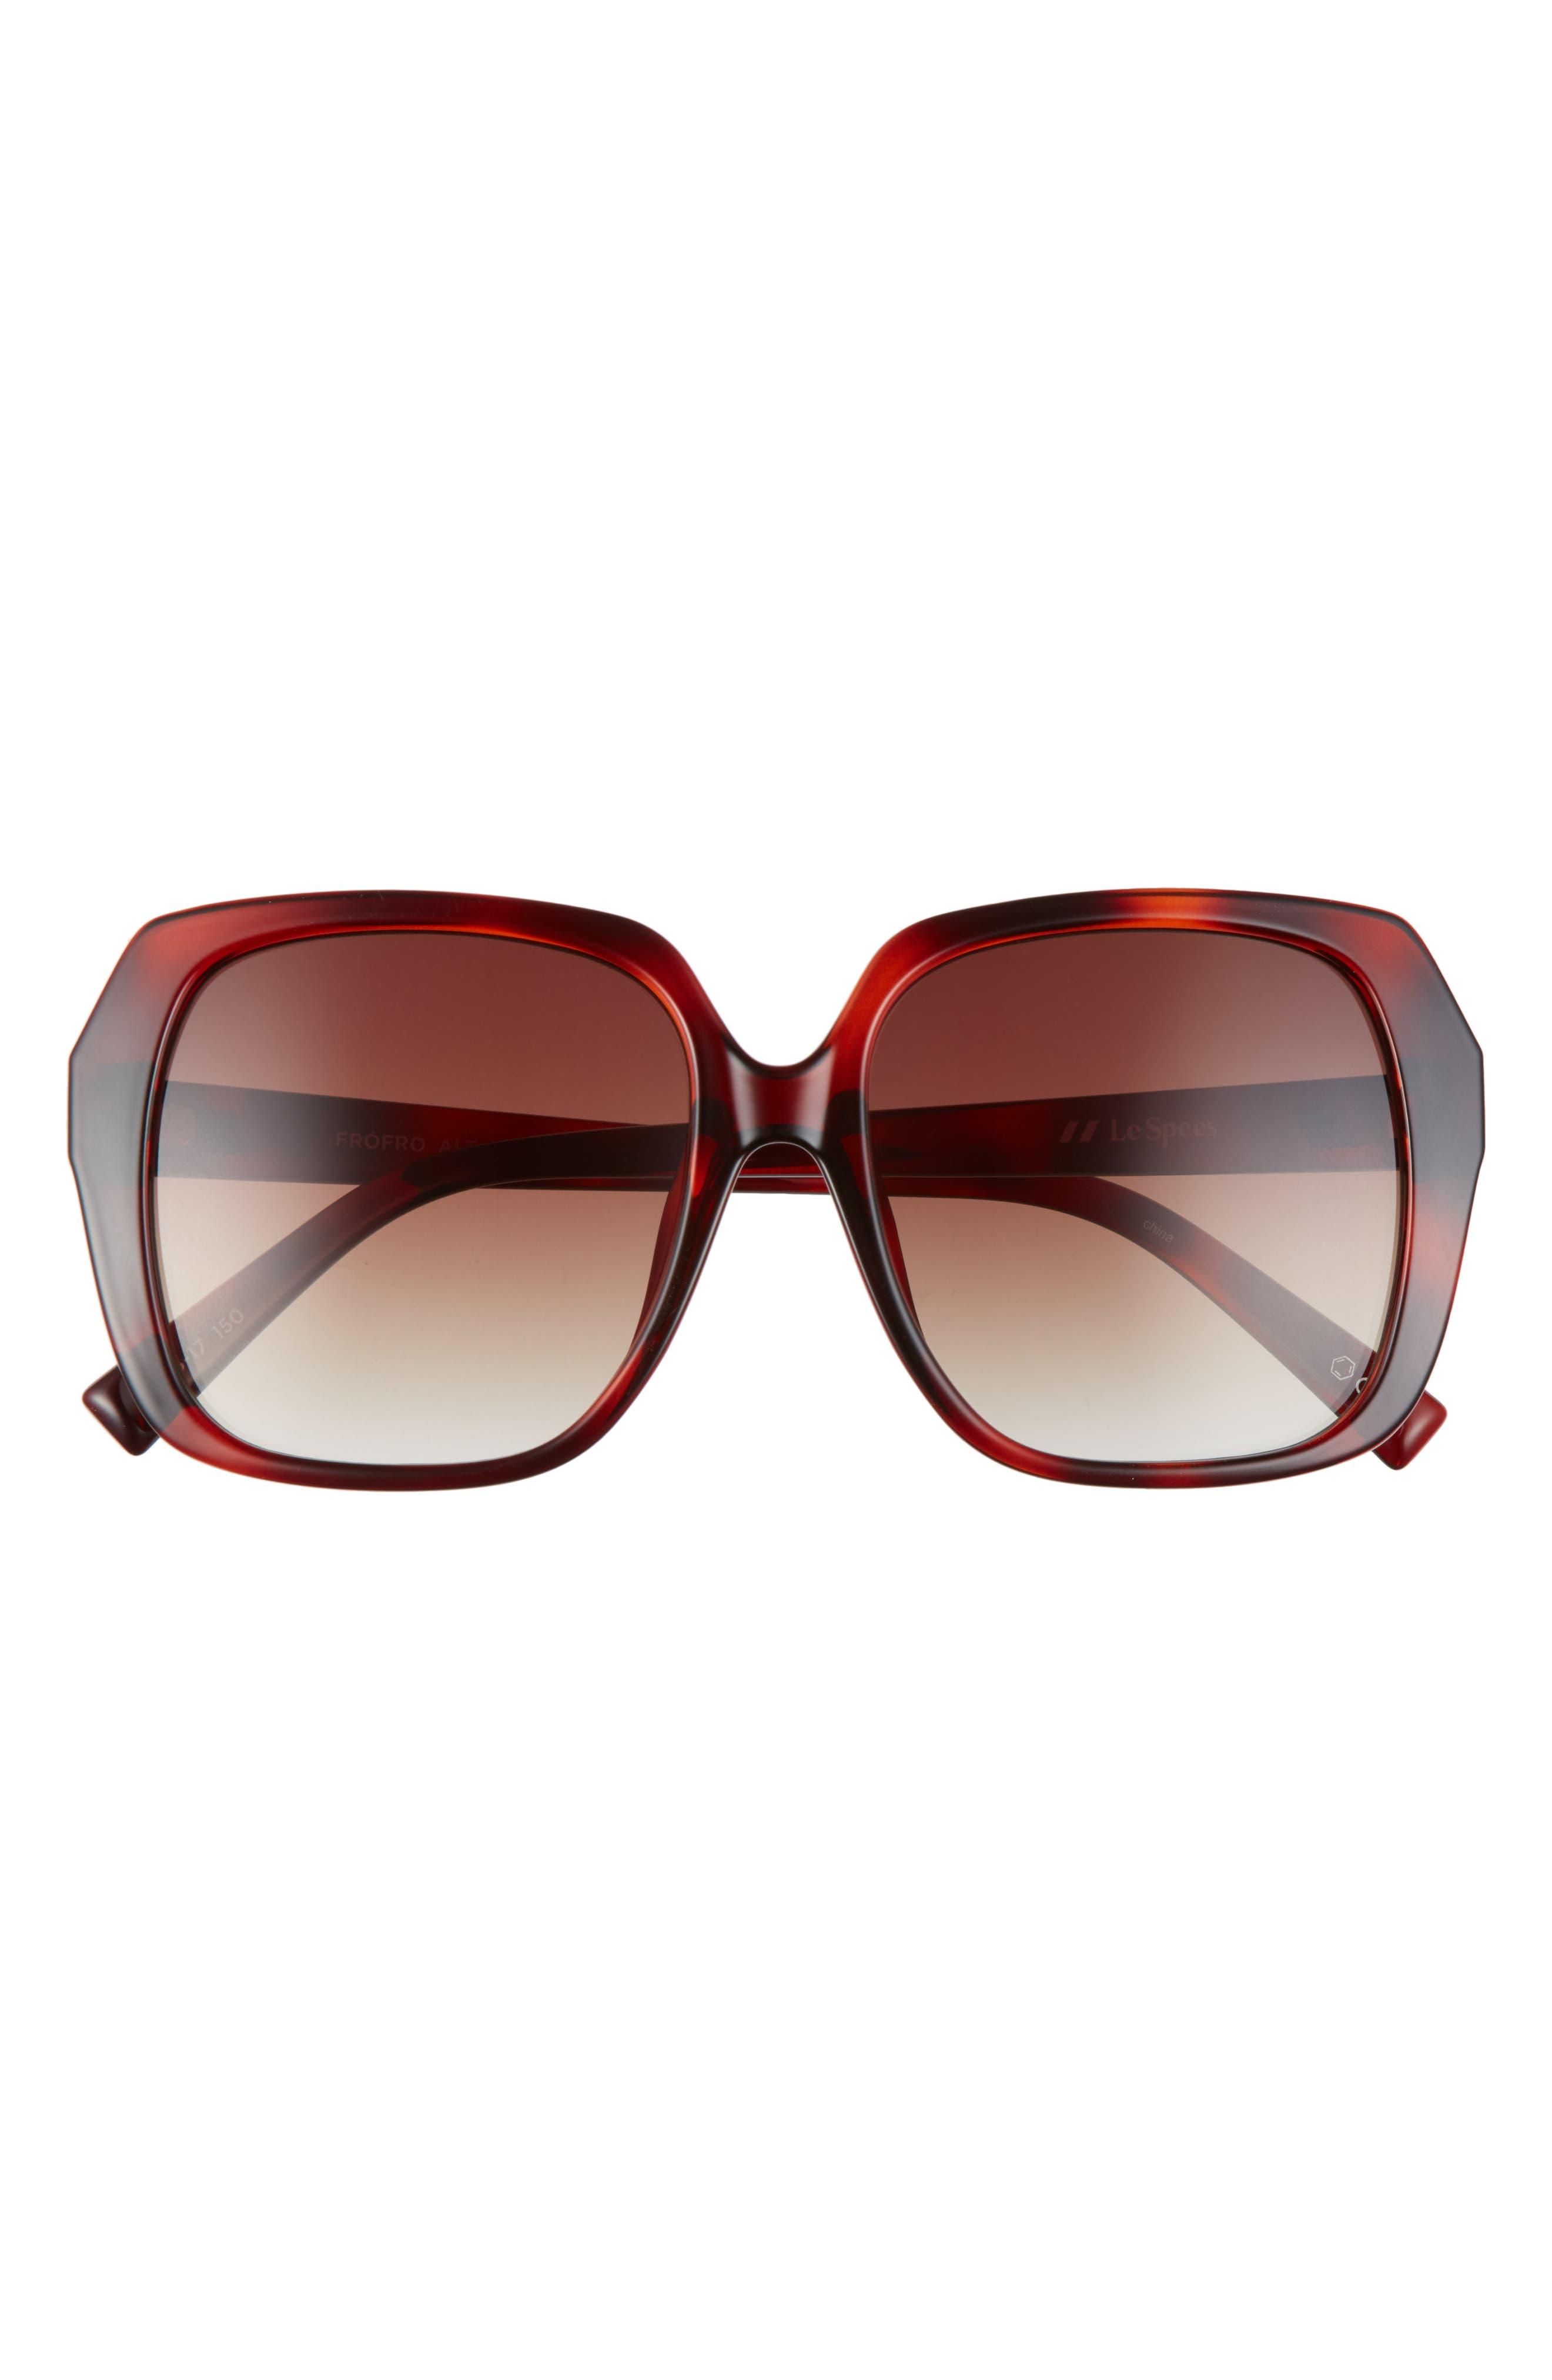 Frofro Alt Fit 56mm Gradient Square Sunglasses